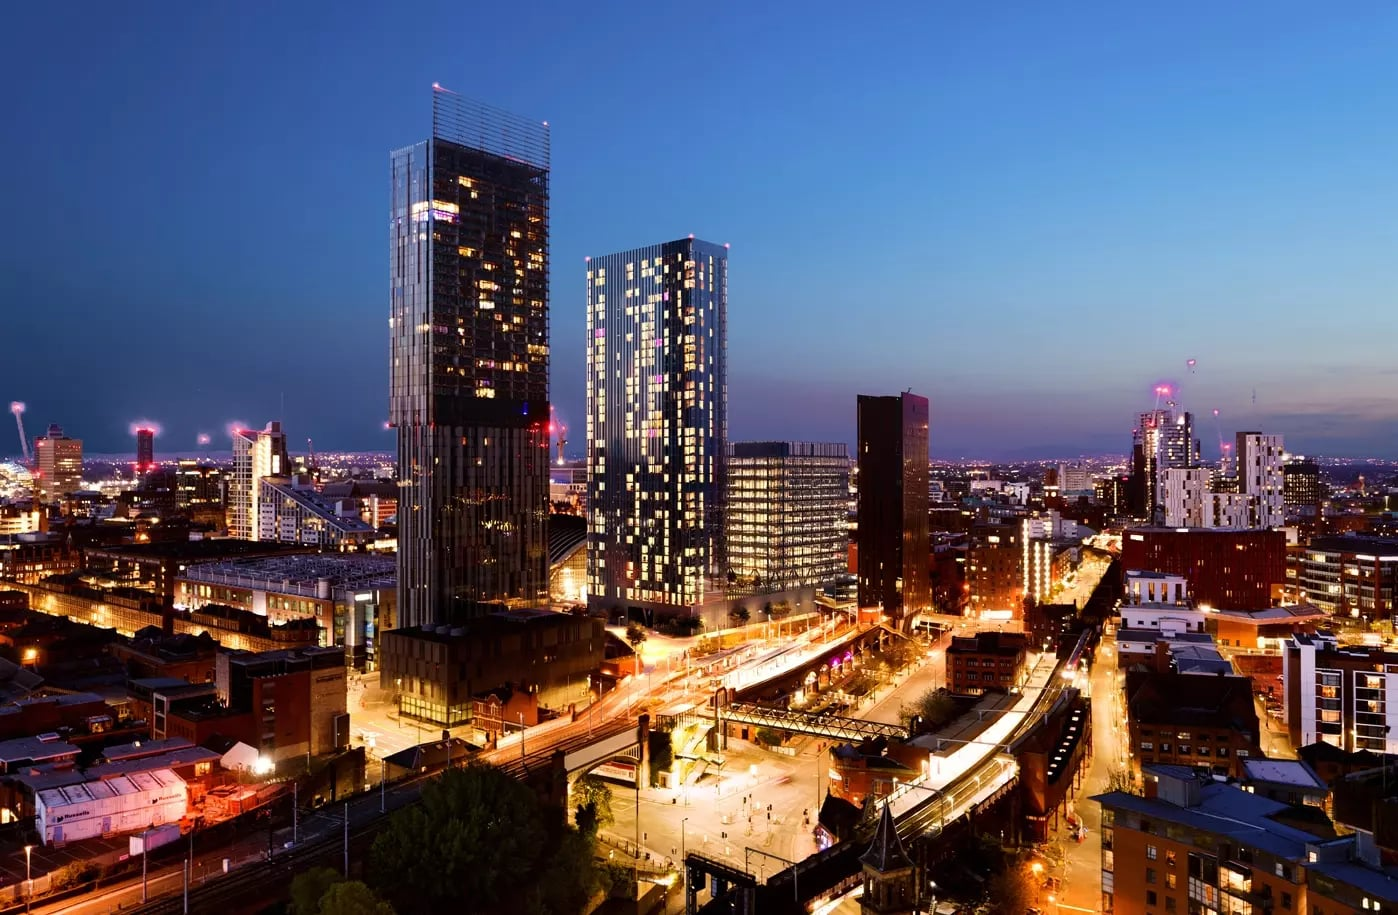 Viadux Manchester